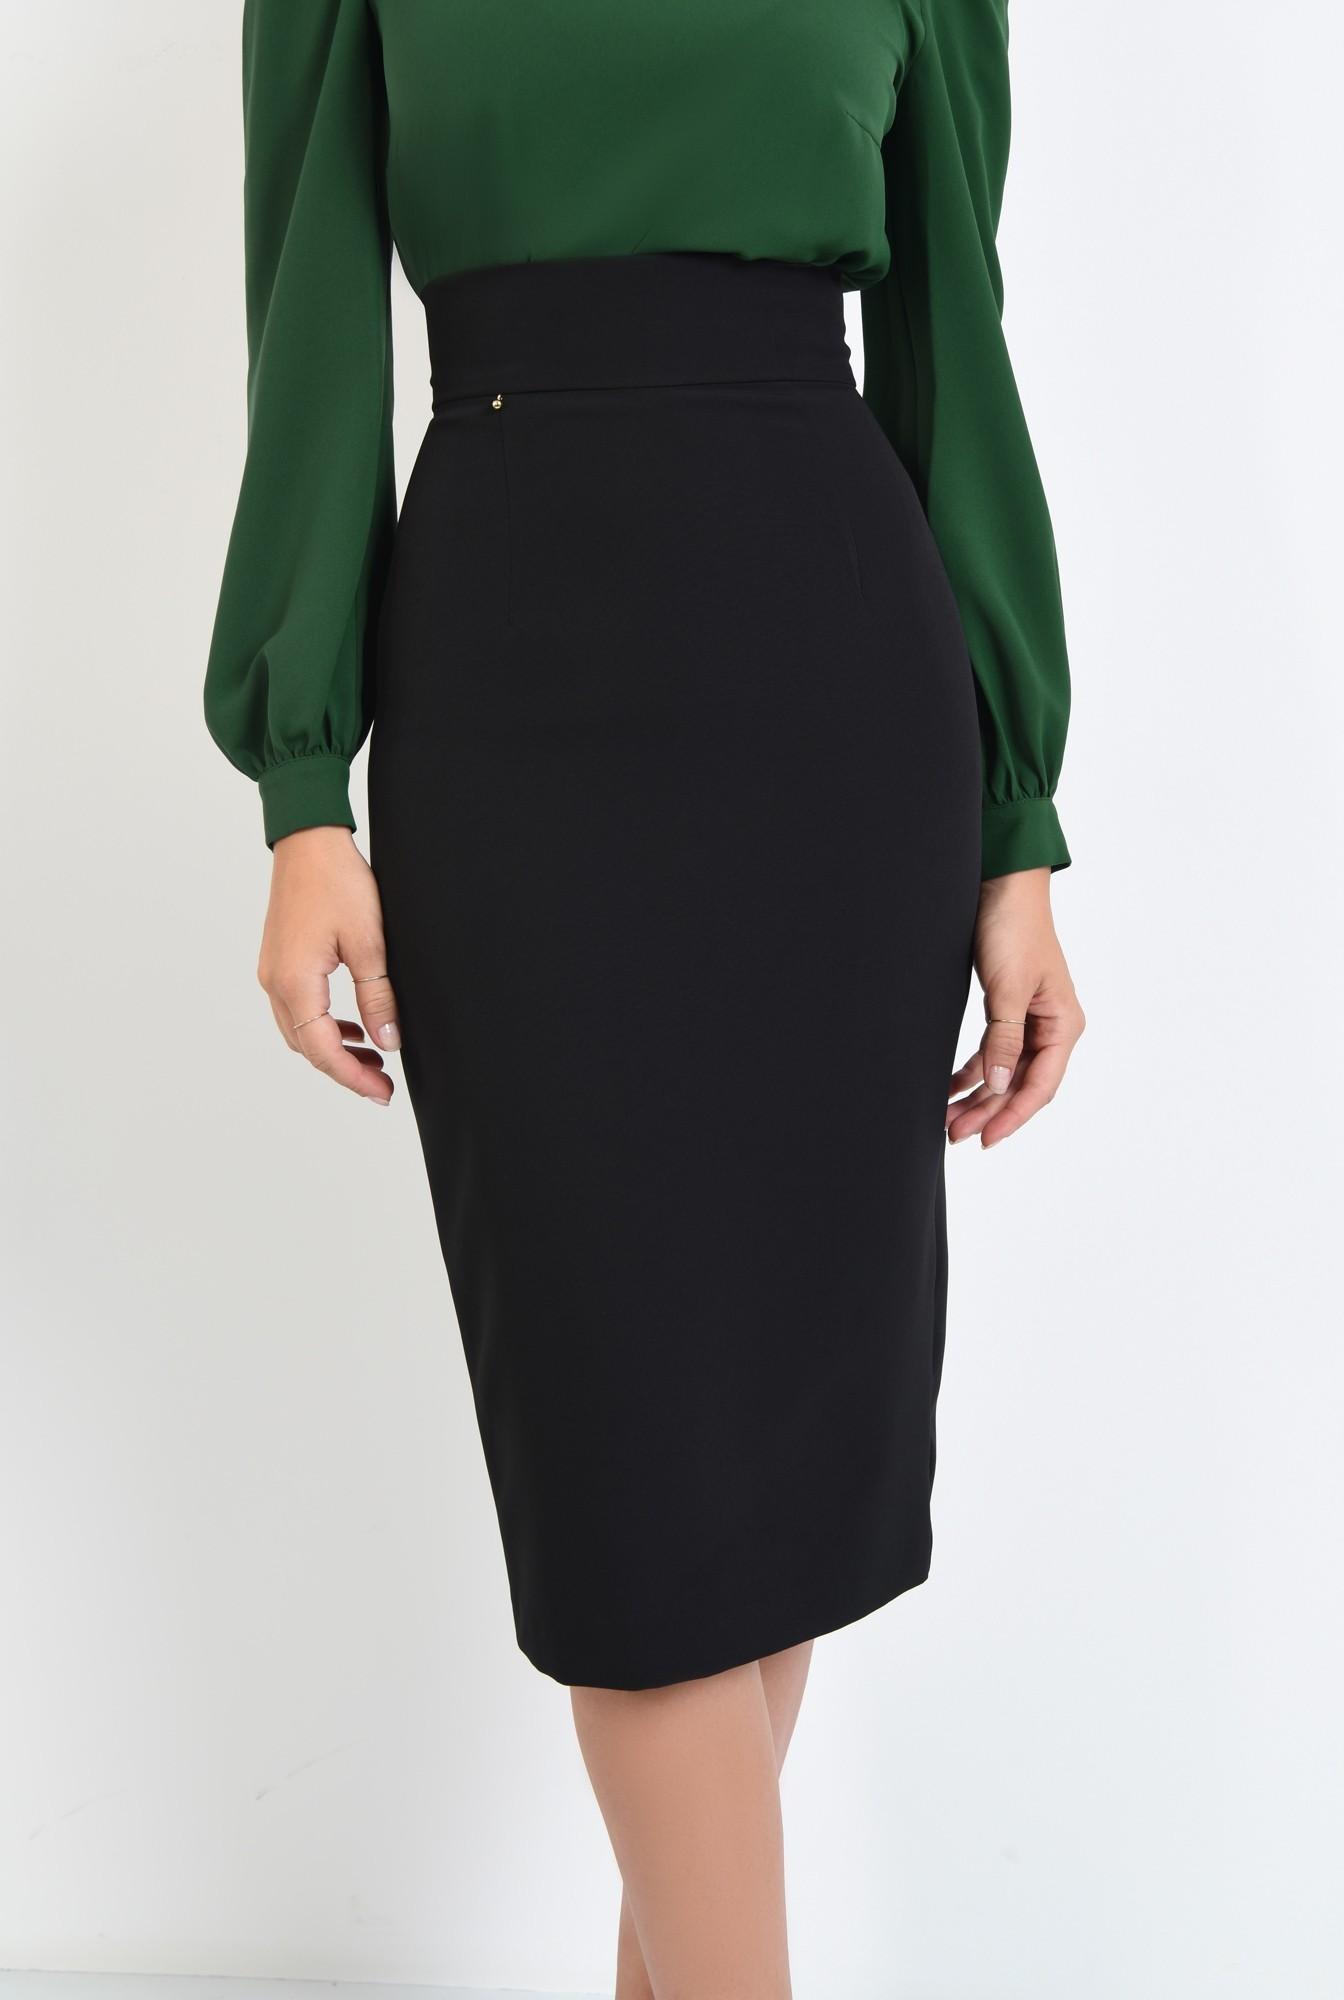 2 - fusta mulata, neagra, tesatura elastica